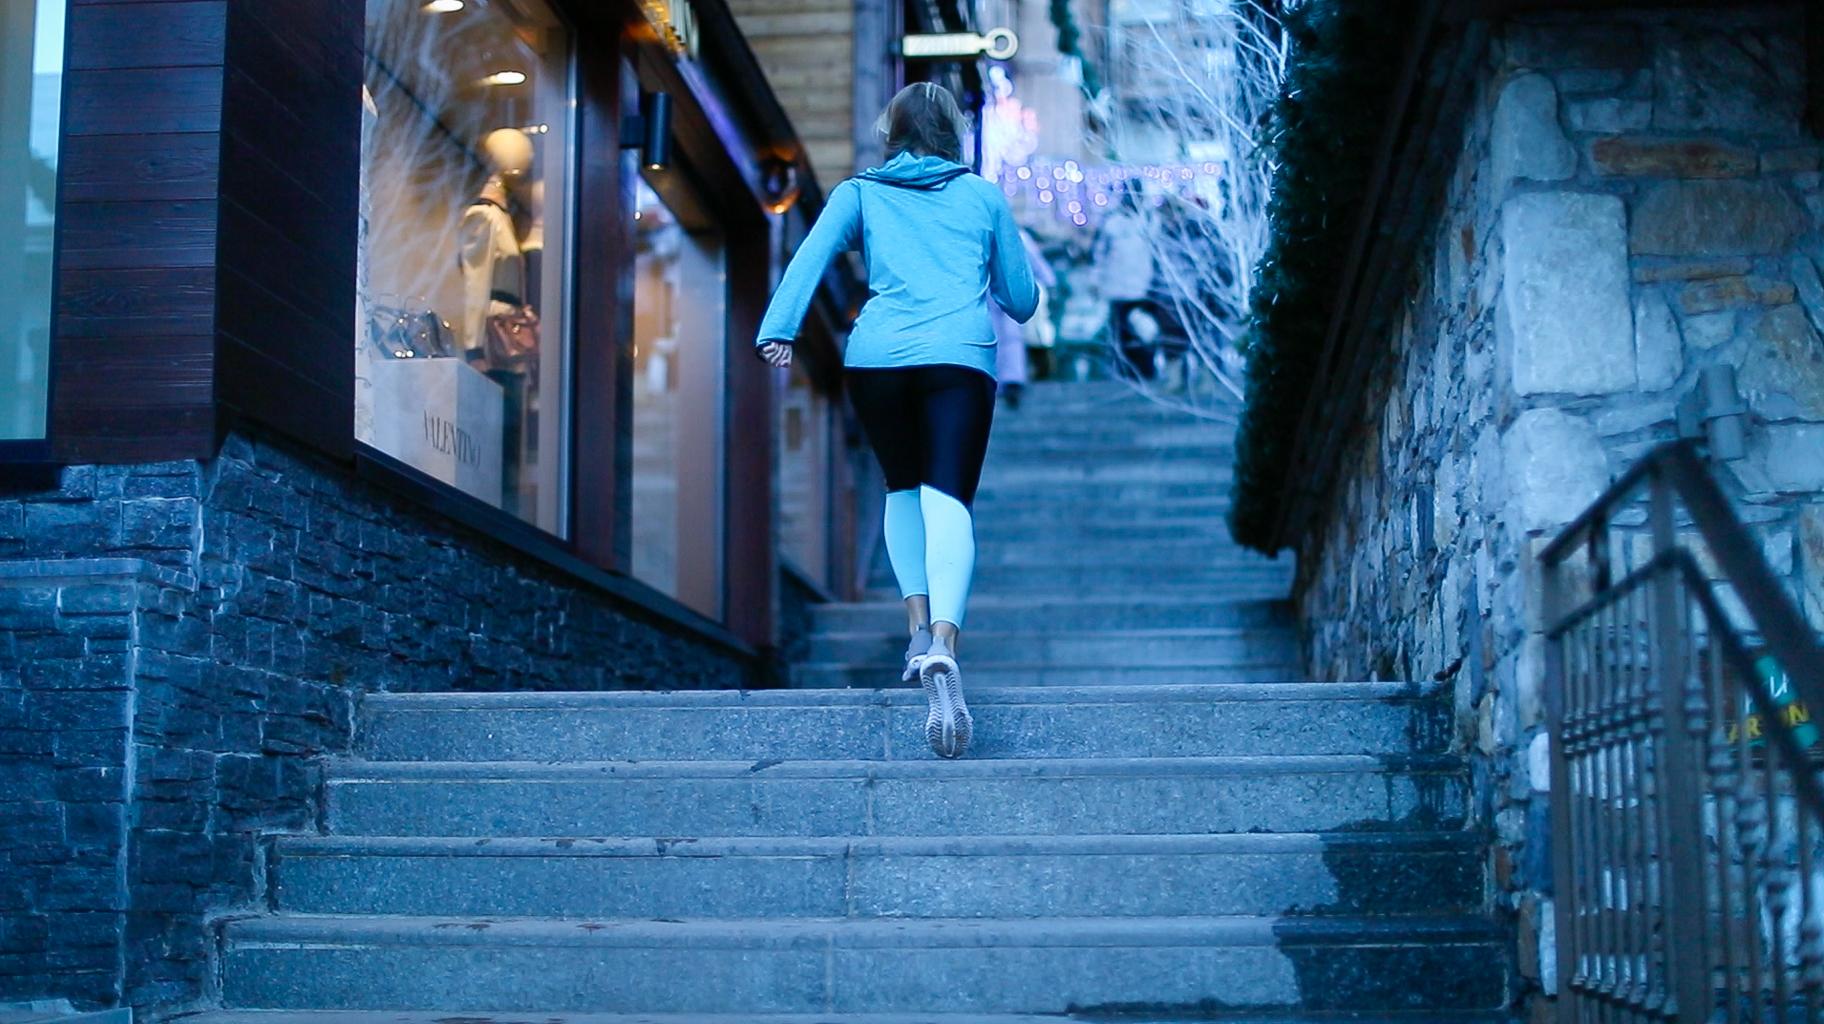 Fitness On Toast Faya Blog Girl Healthy Workout Matalan Images Power of Movement Benefits Walk Power Bodyweight Training-4